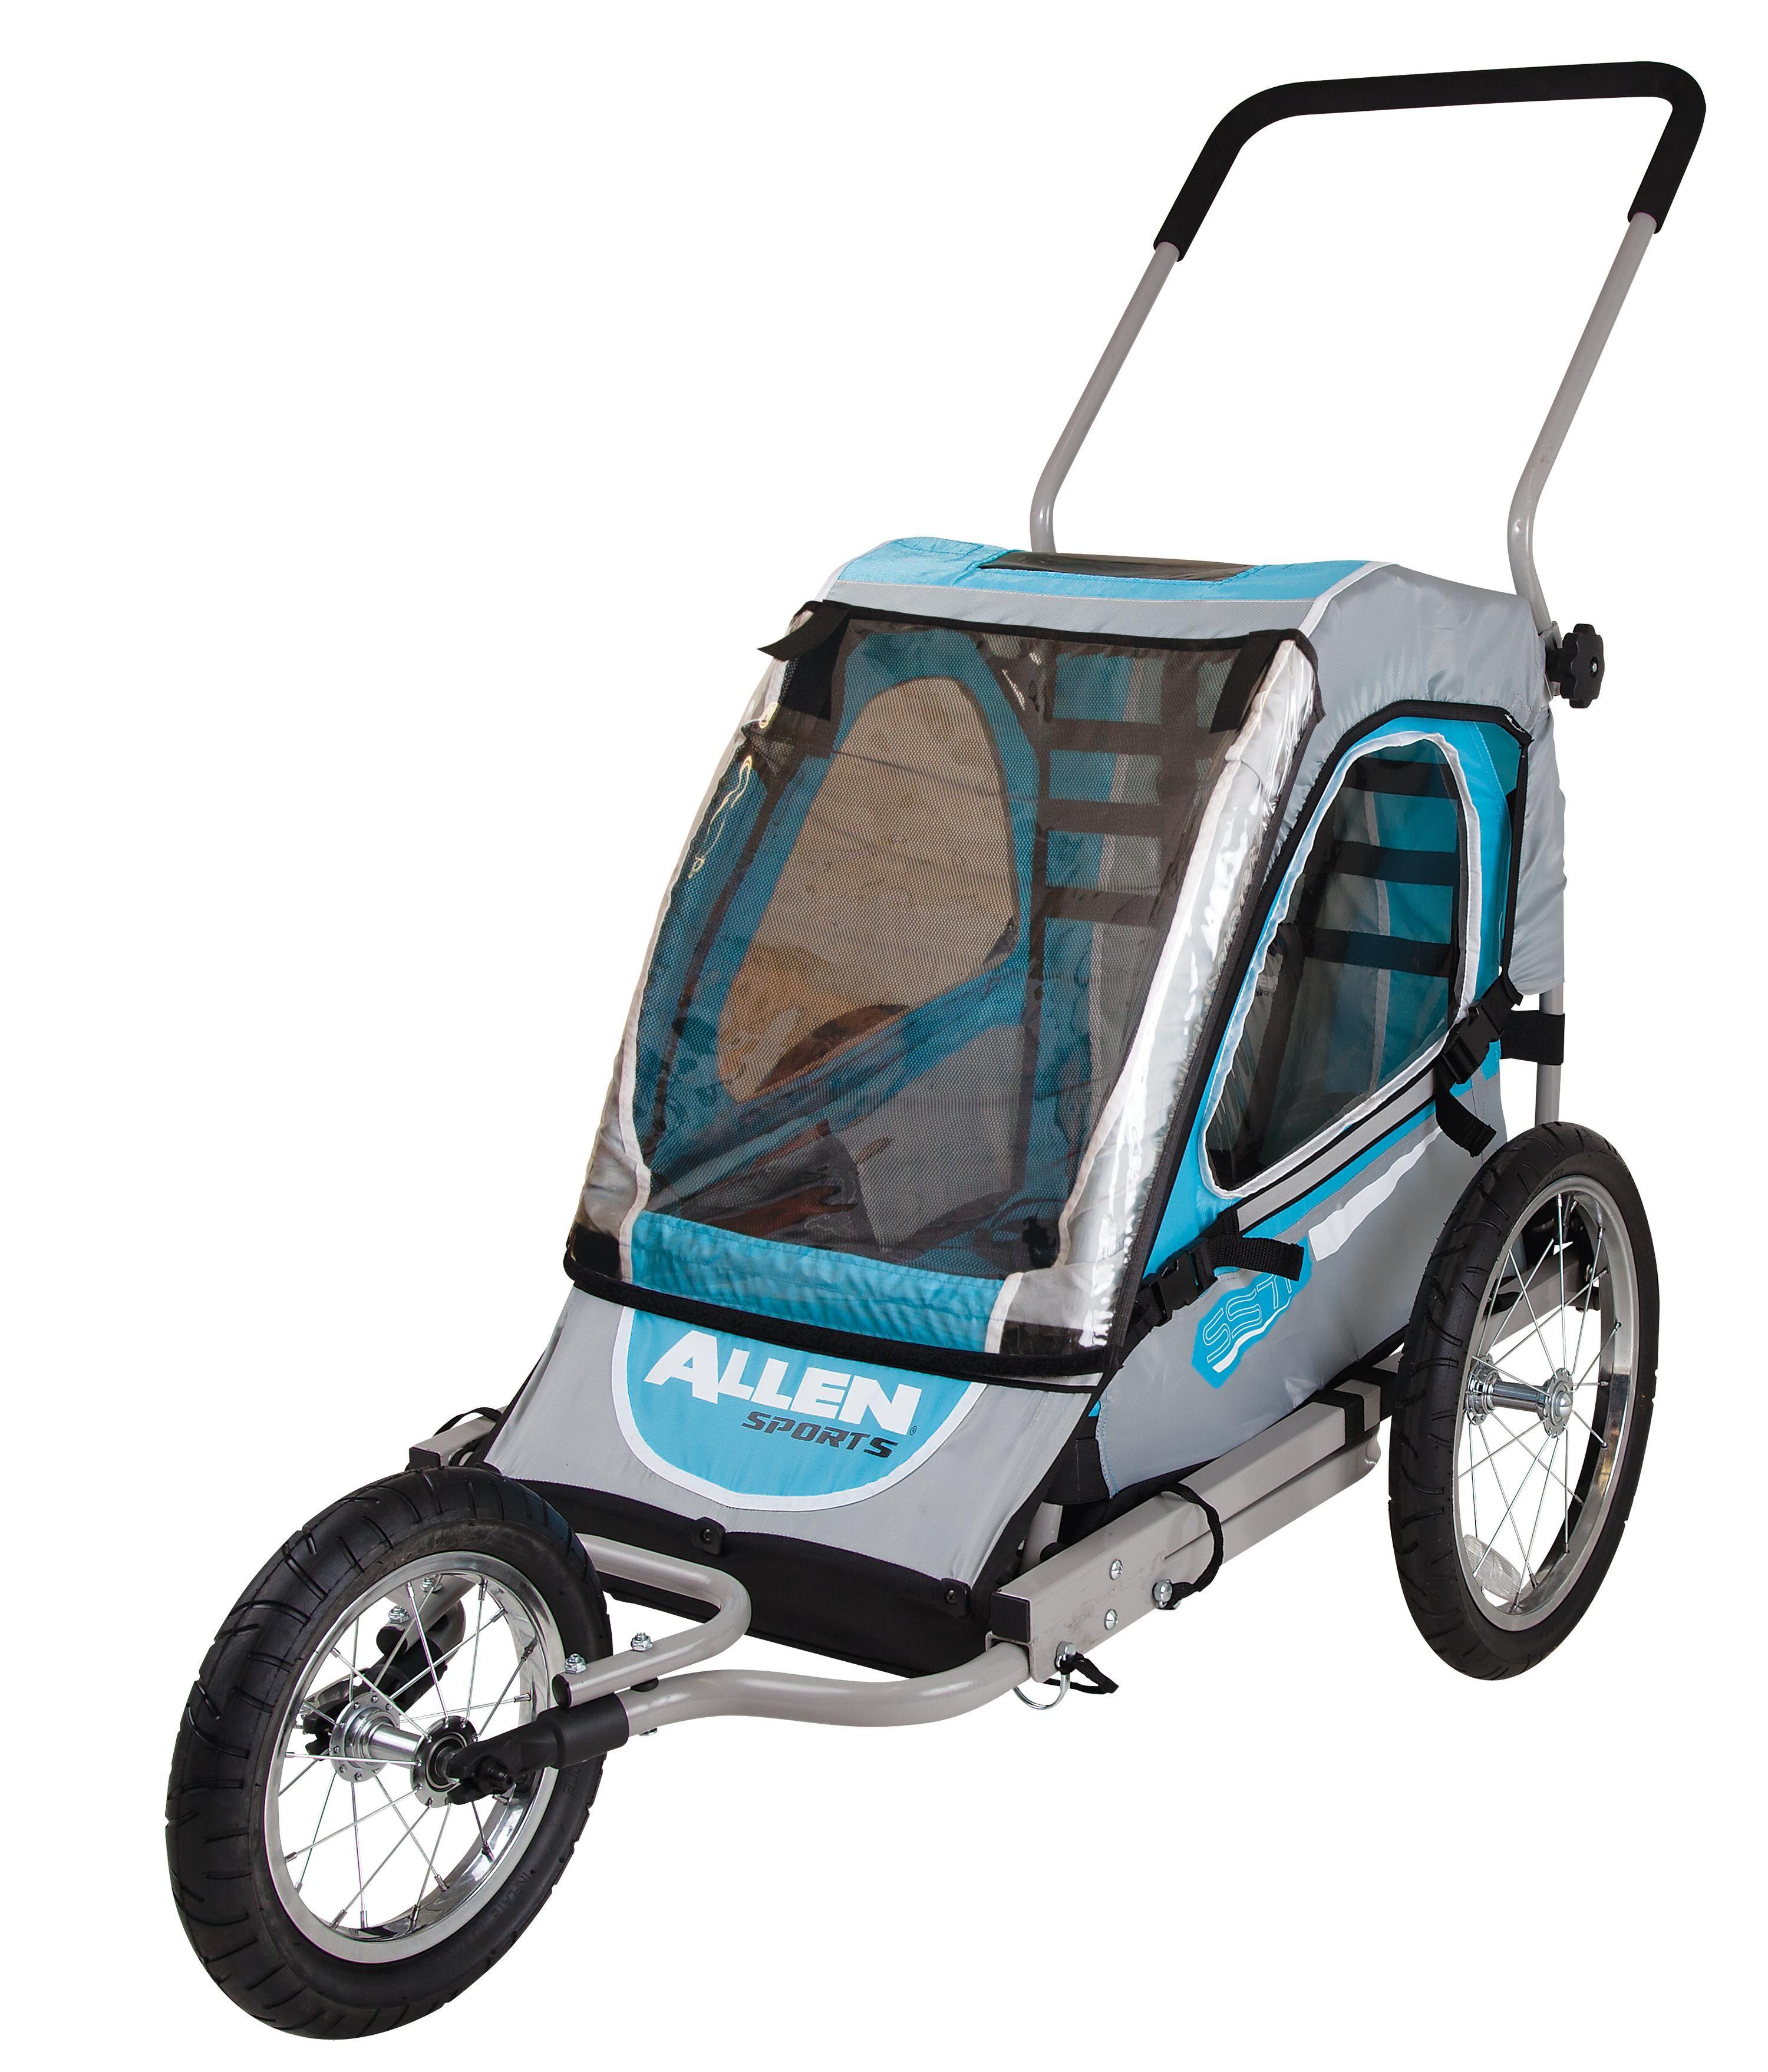 Allen Sports Premier 1Child Jogger/Bike Trailer Amazon